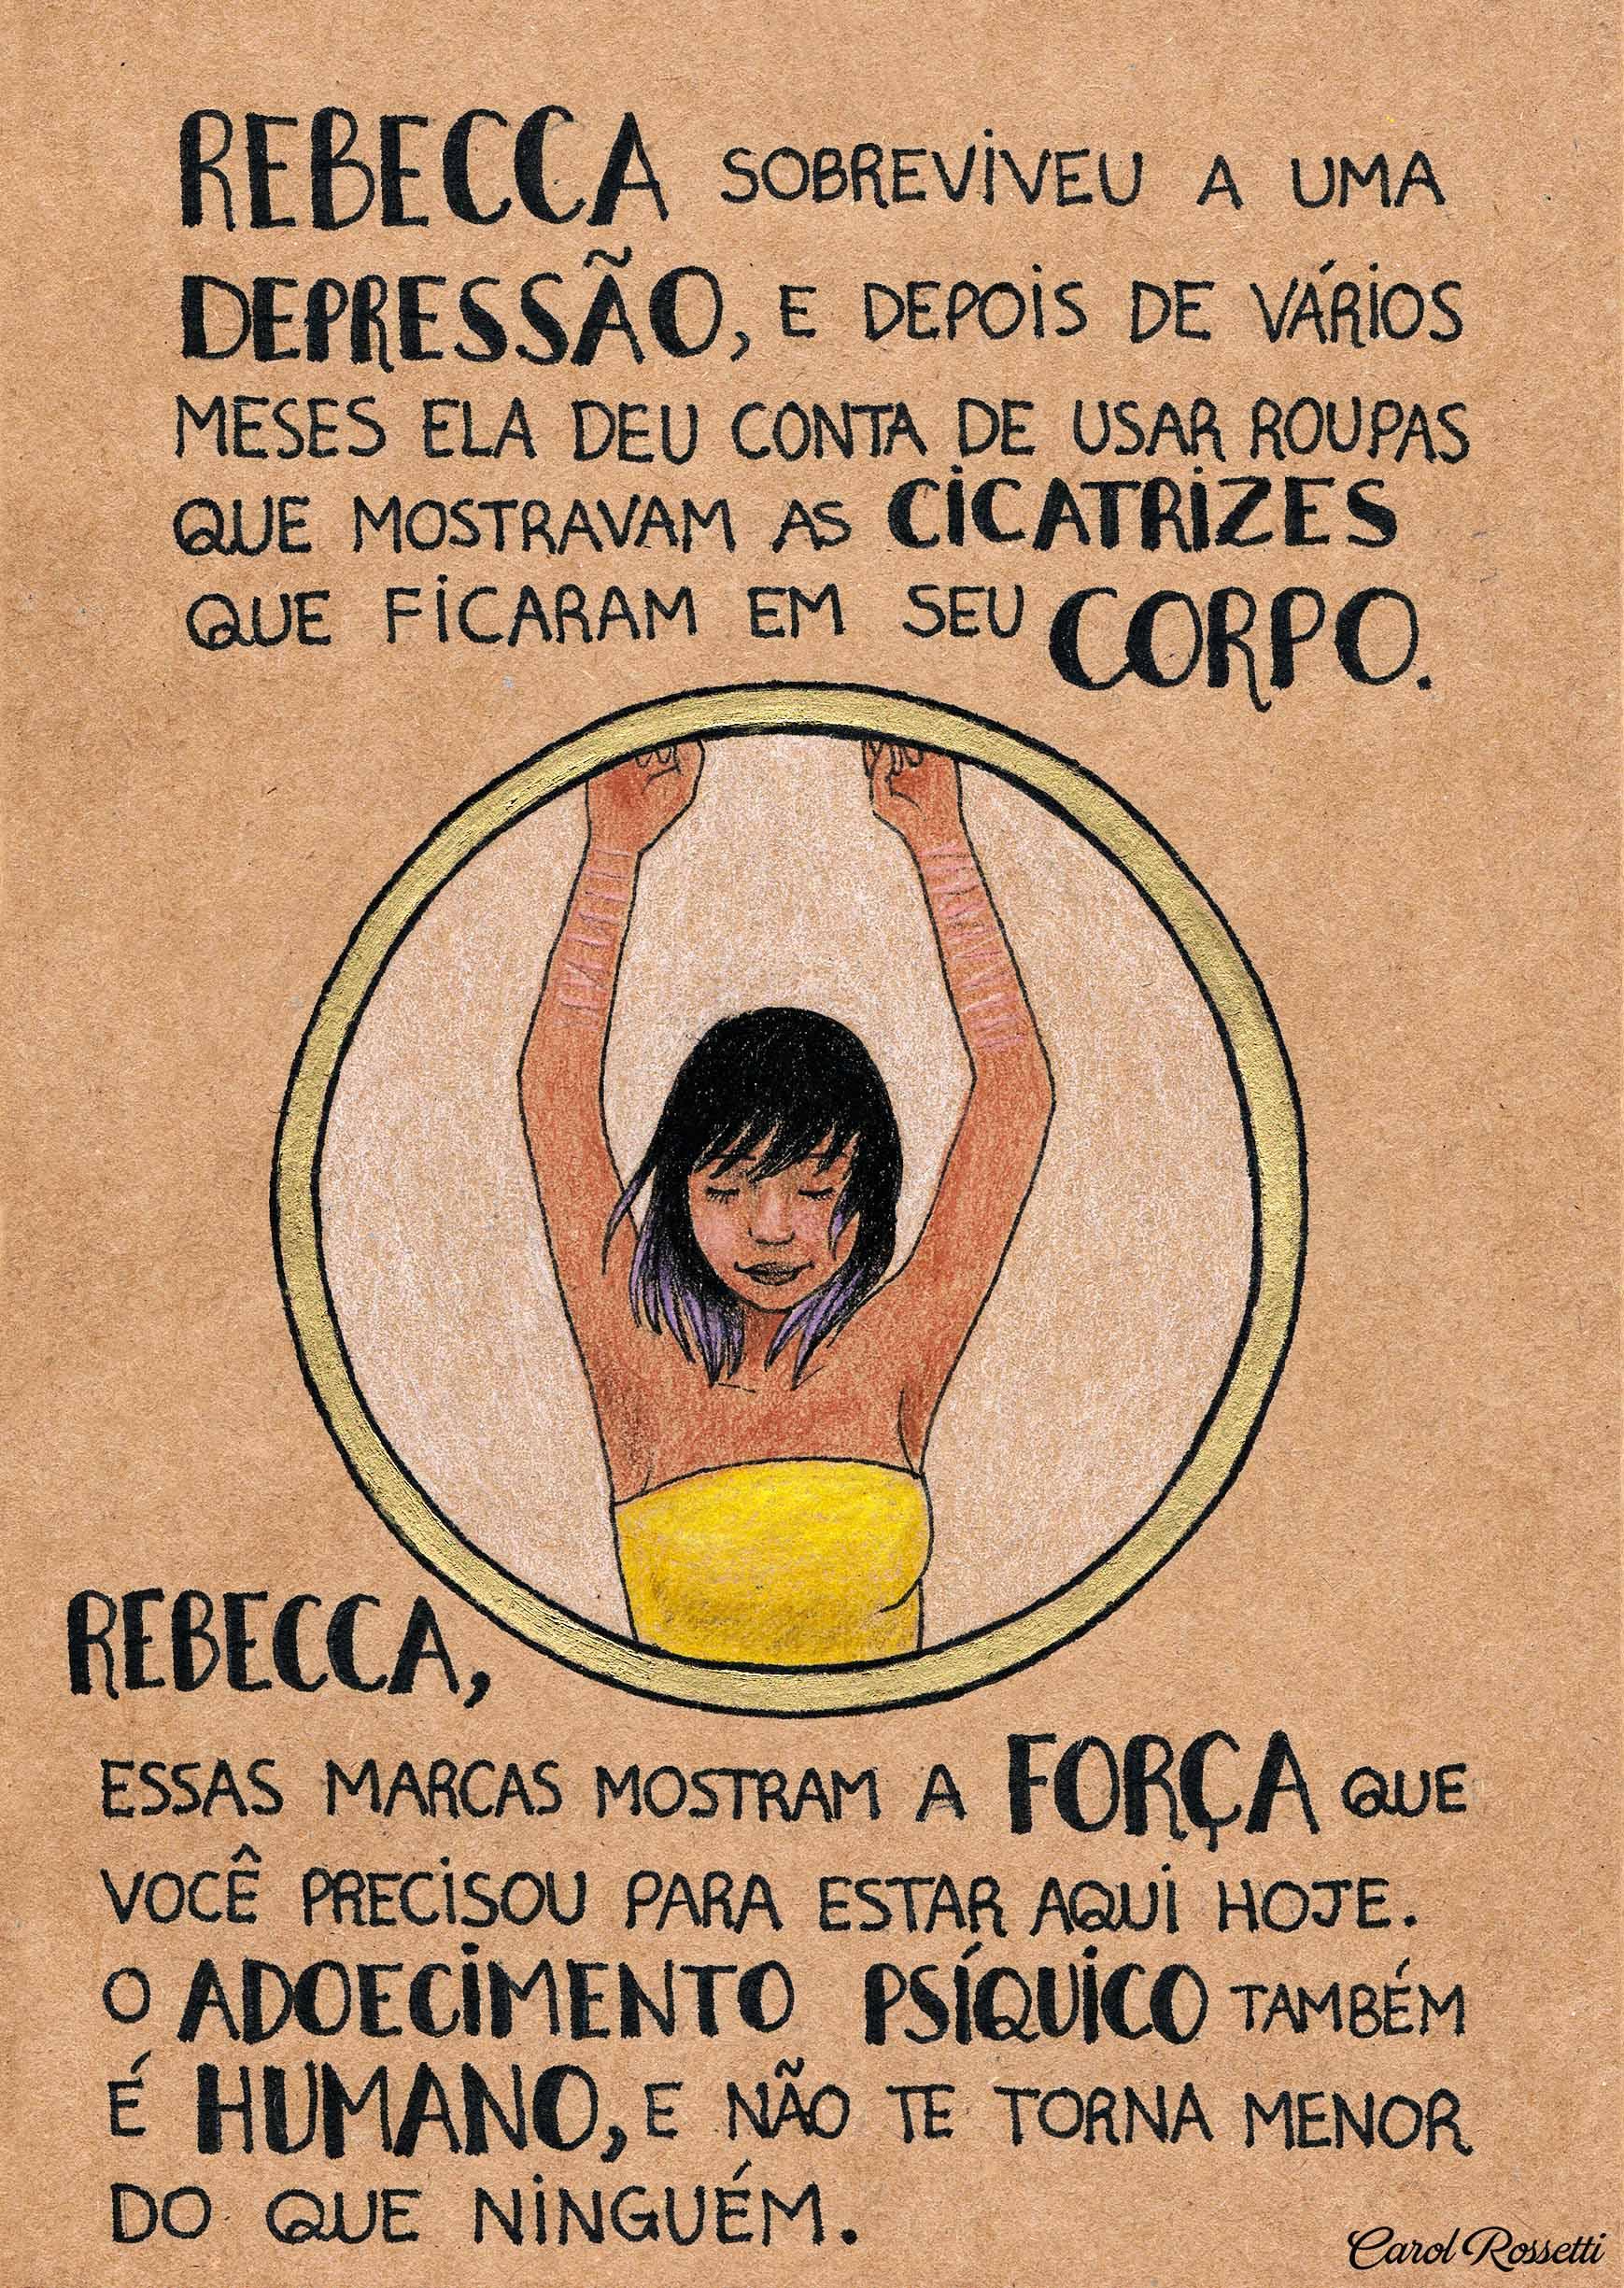 CR_REBECCA.jpg